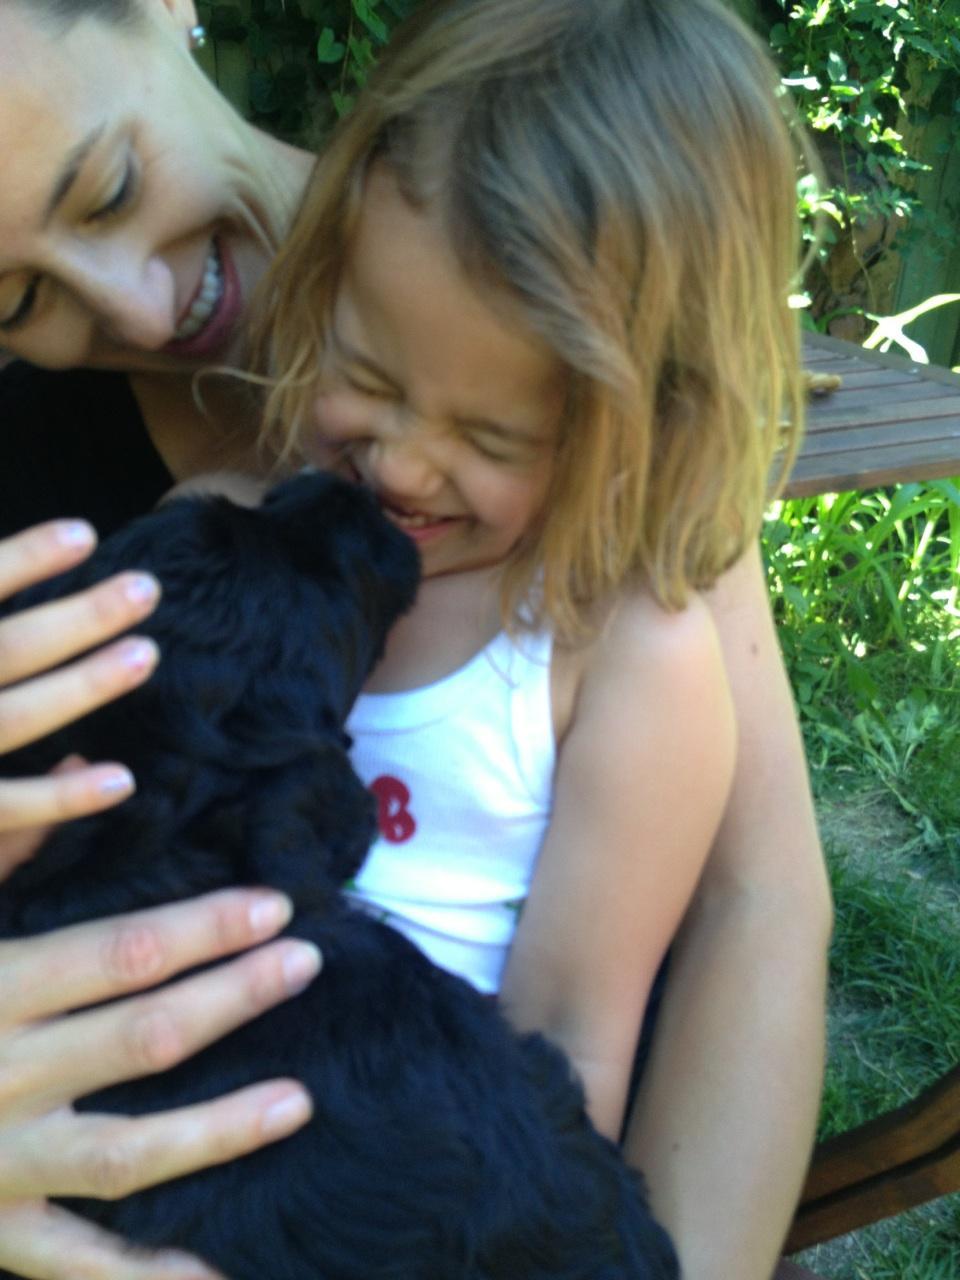 Puppies and children!